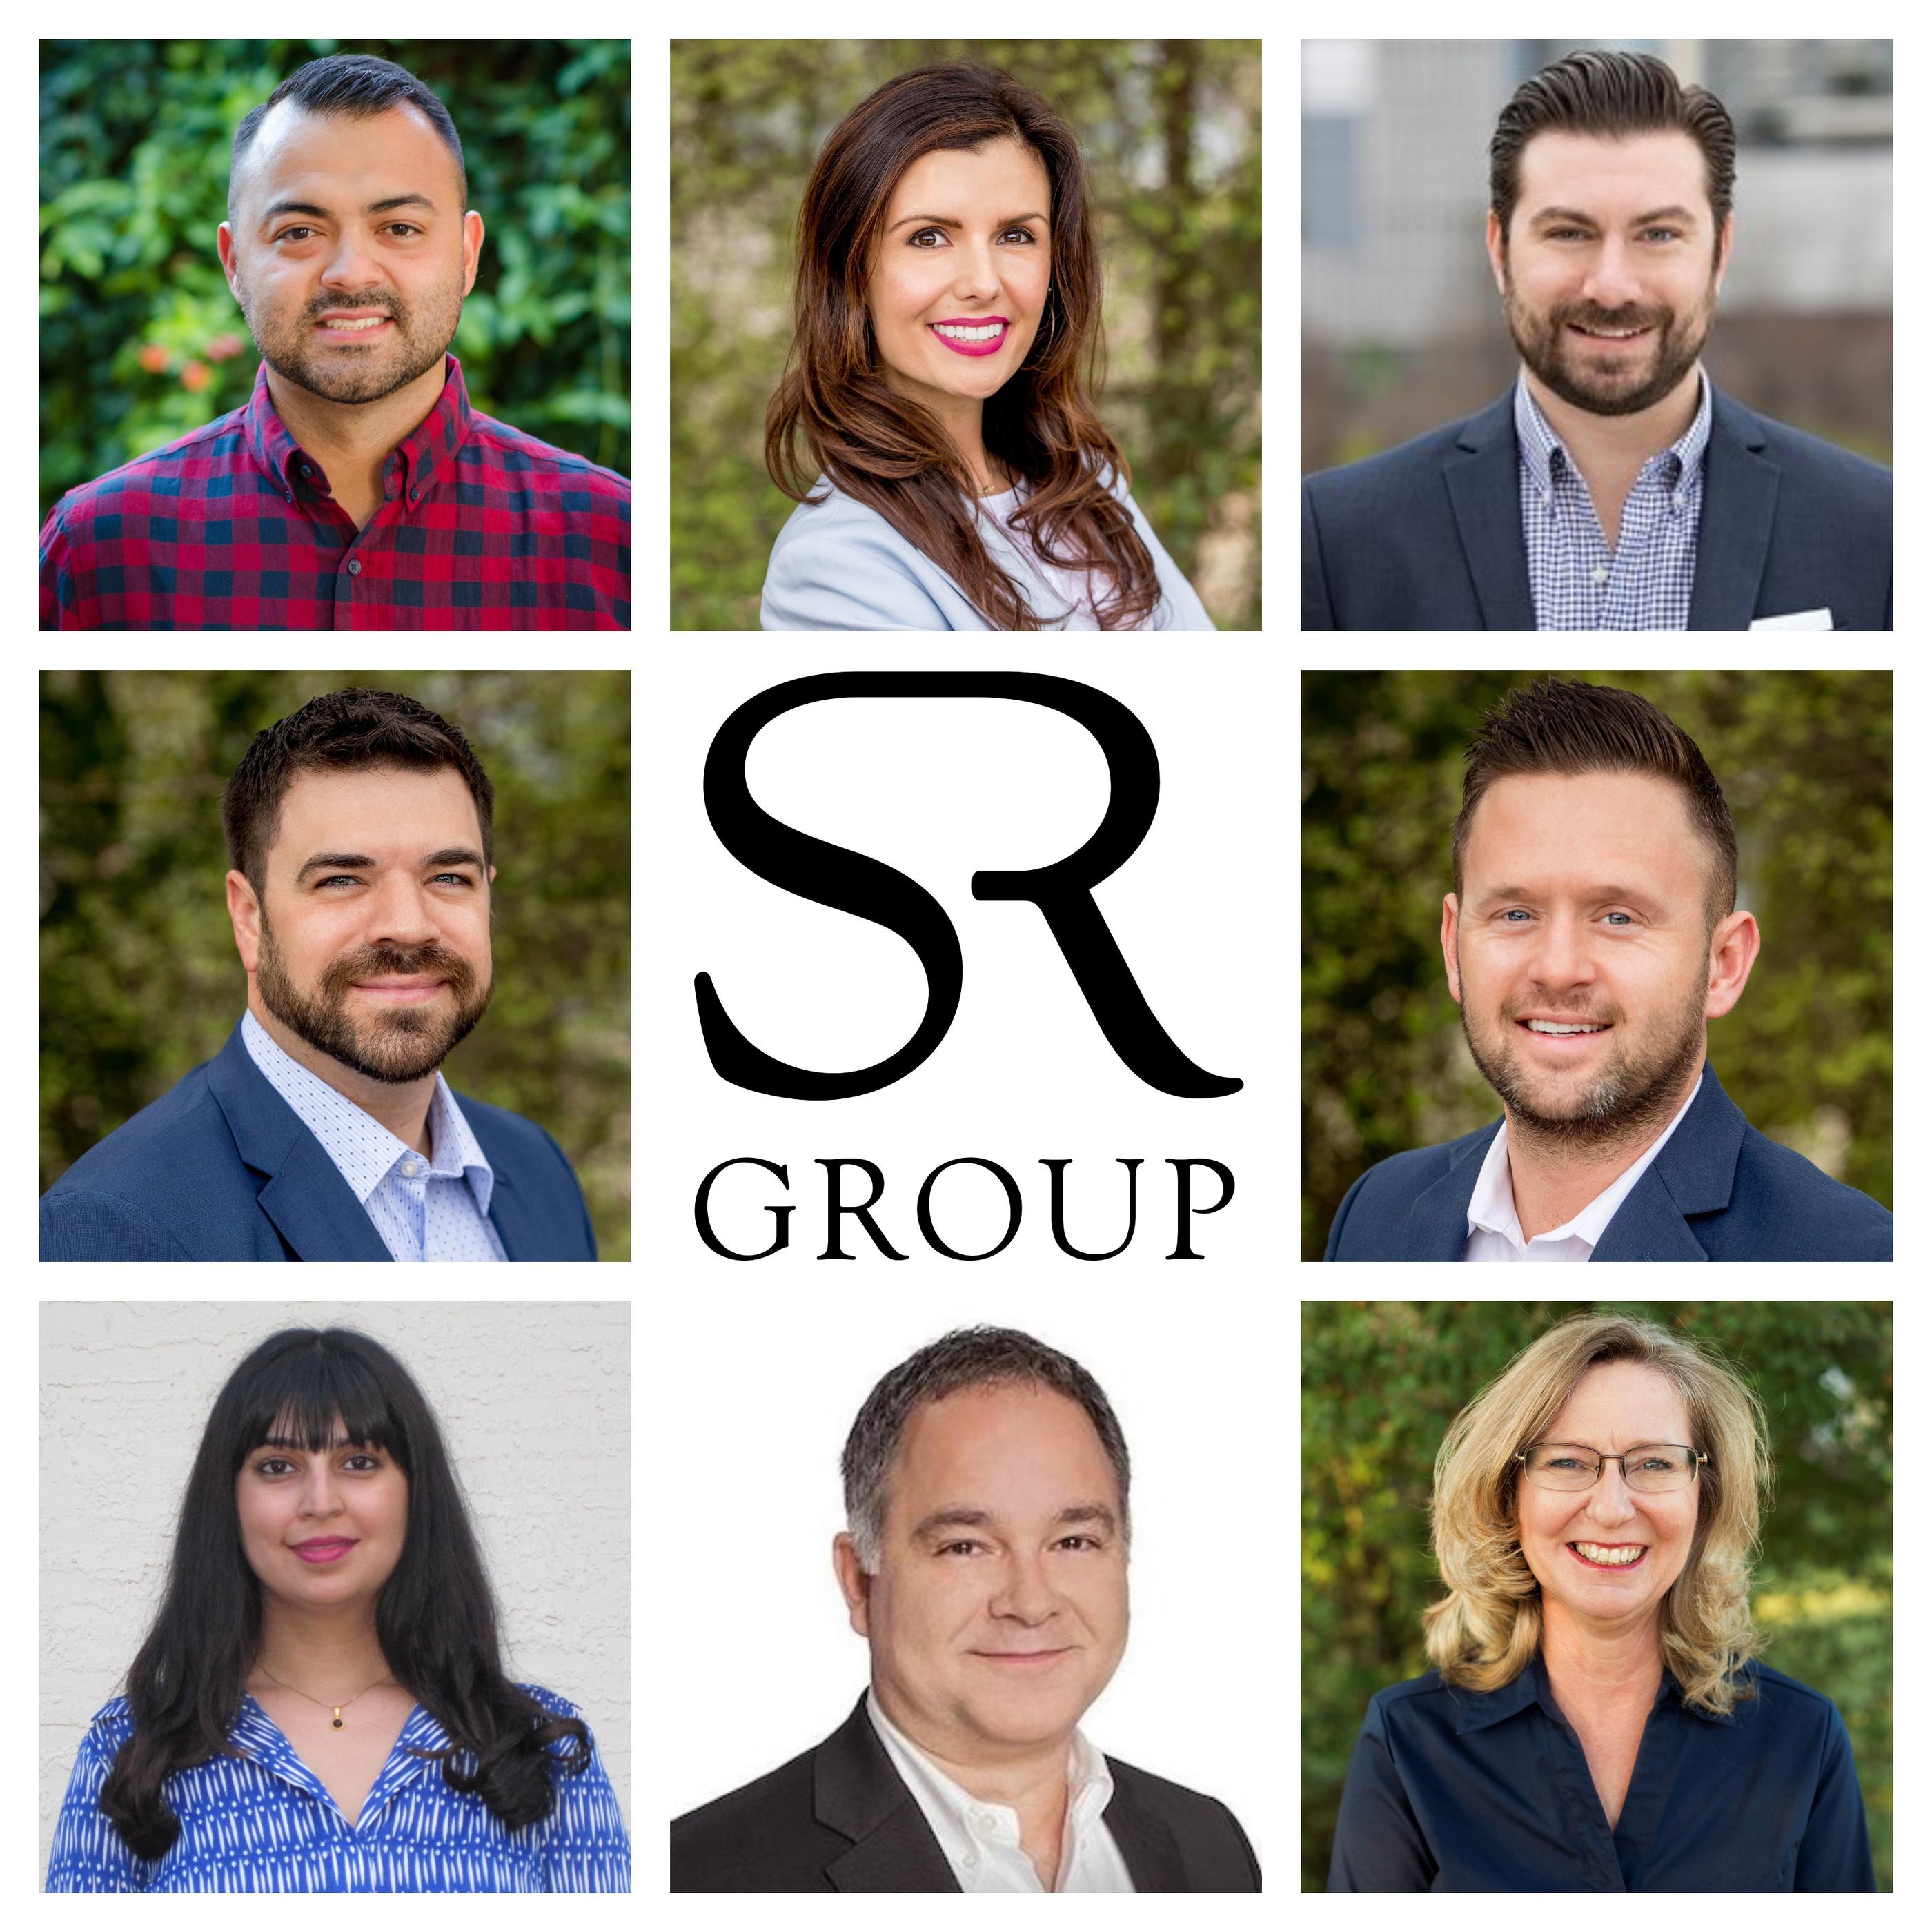 SR Group